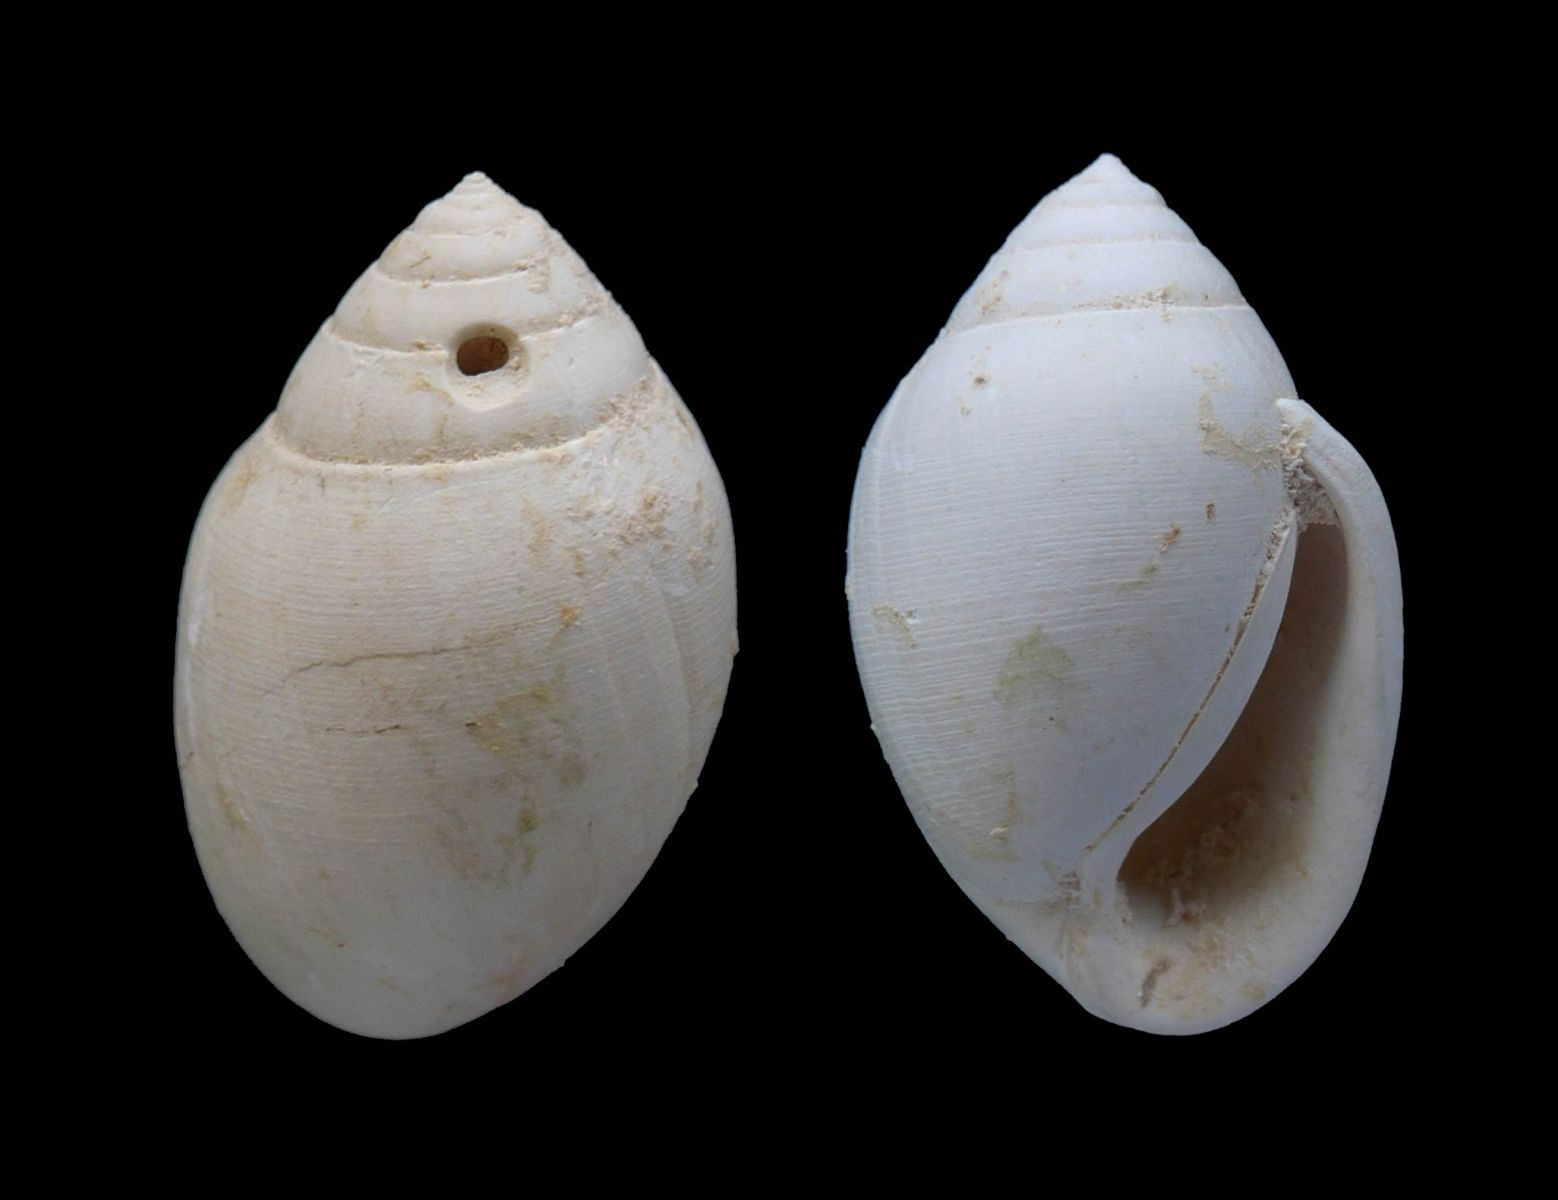 Hemiauricula sp.